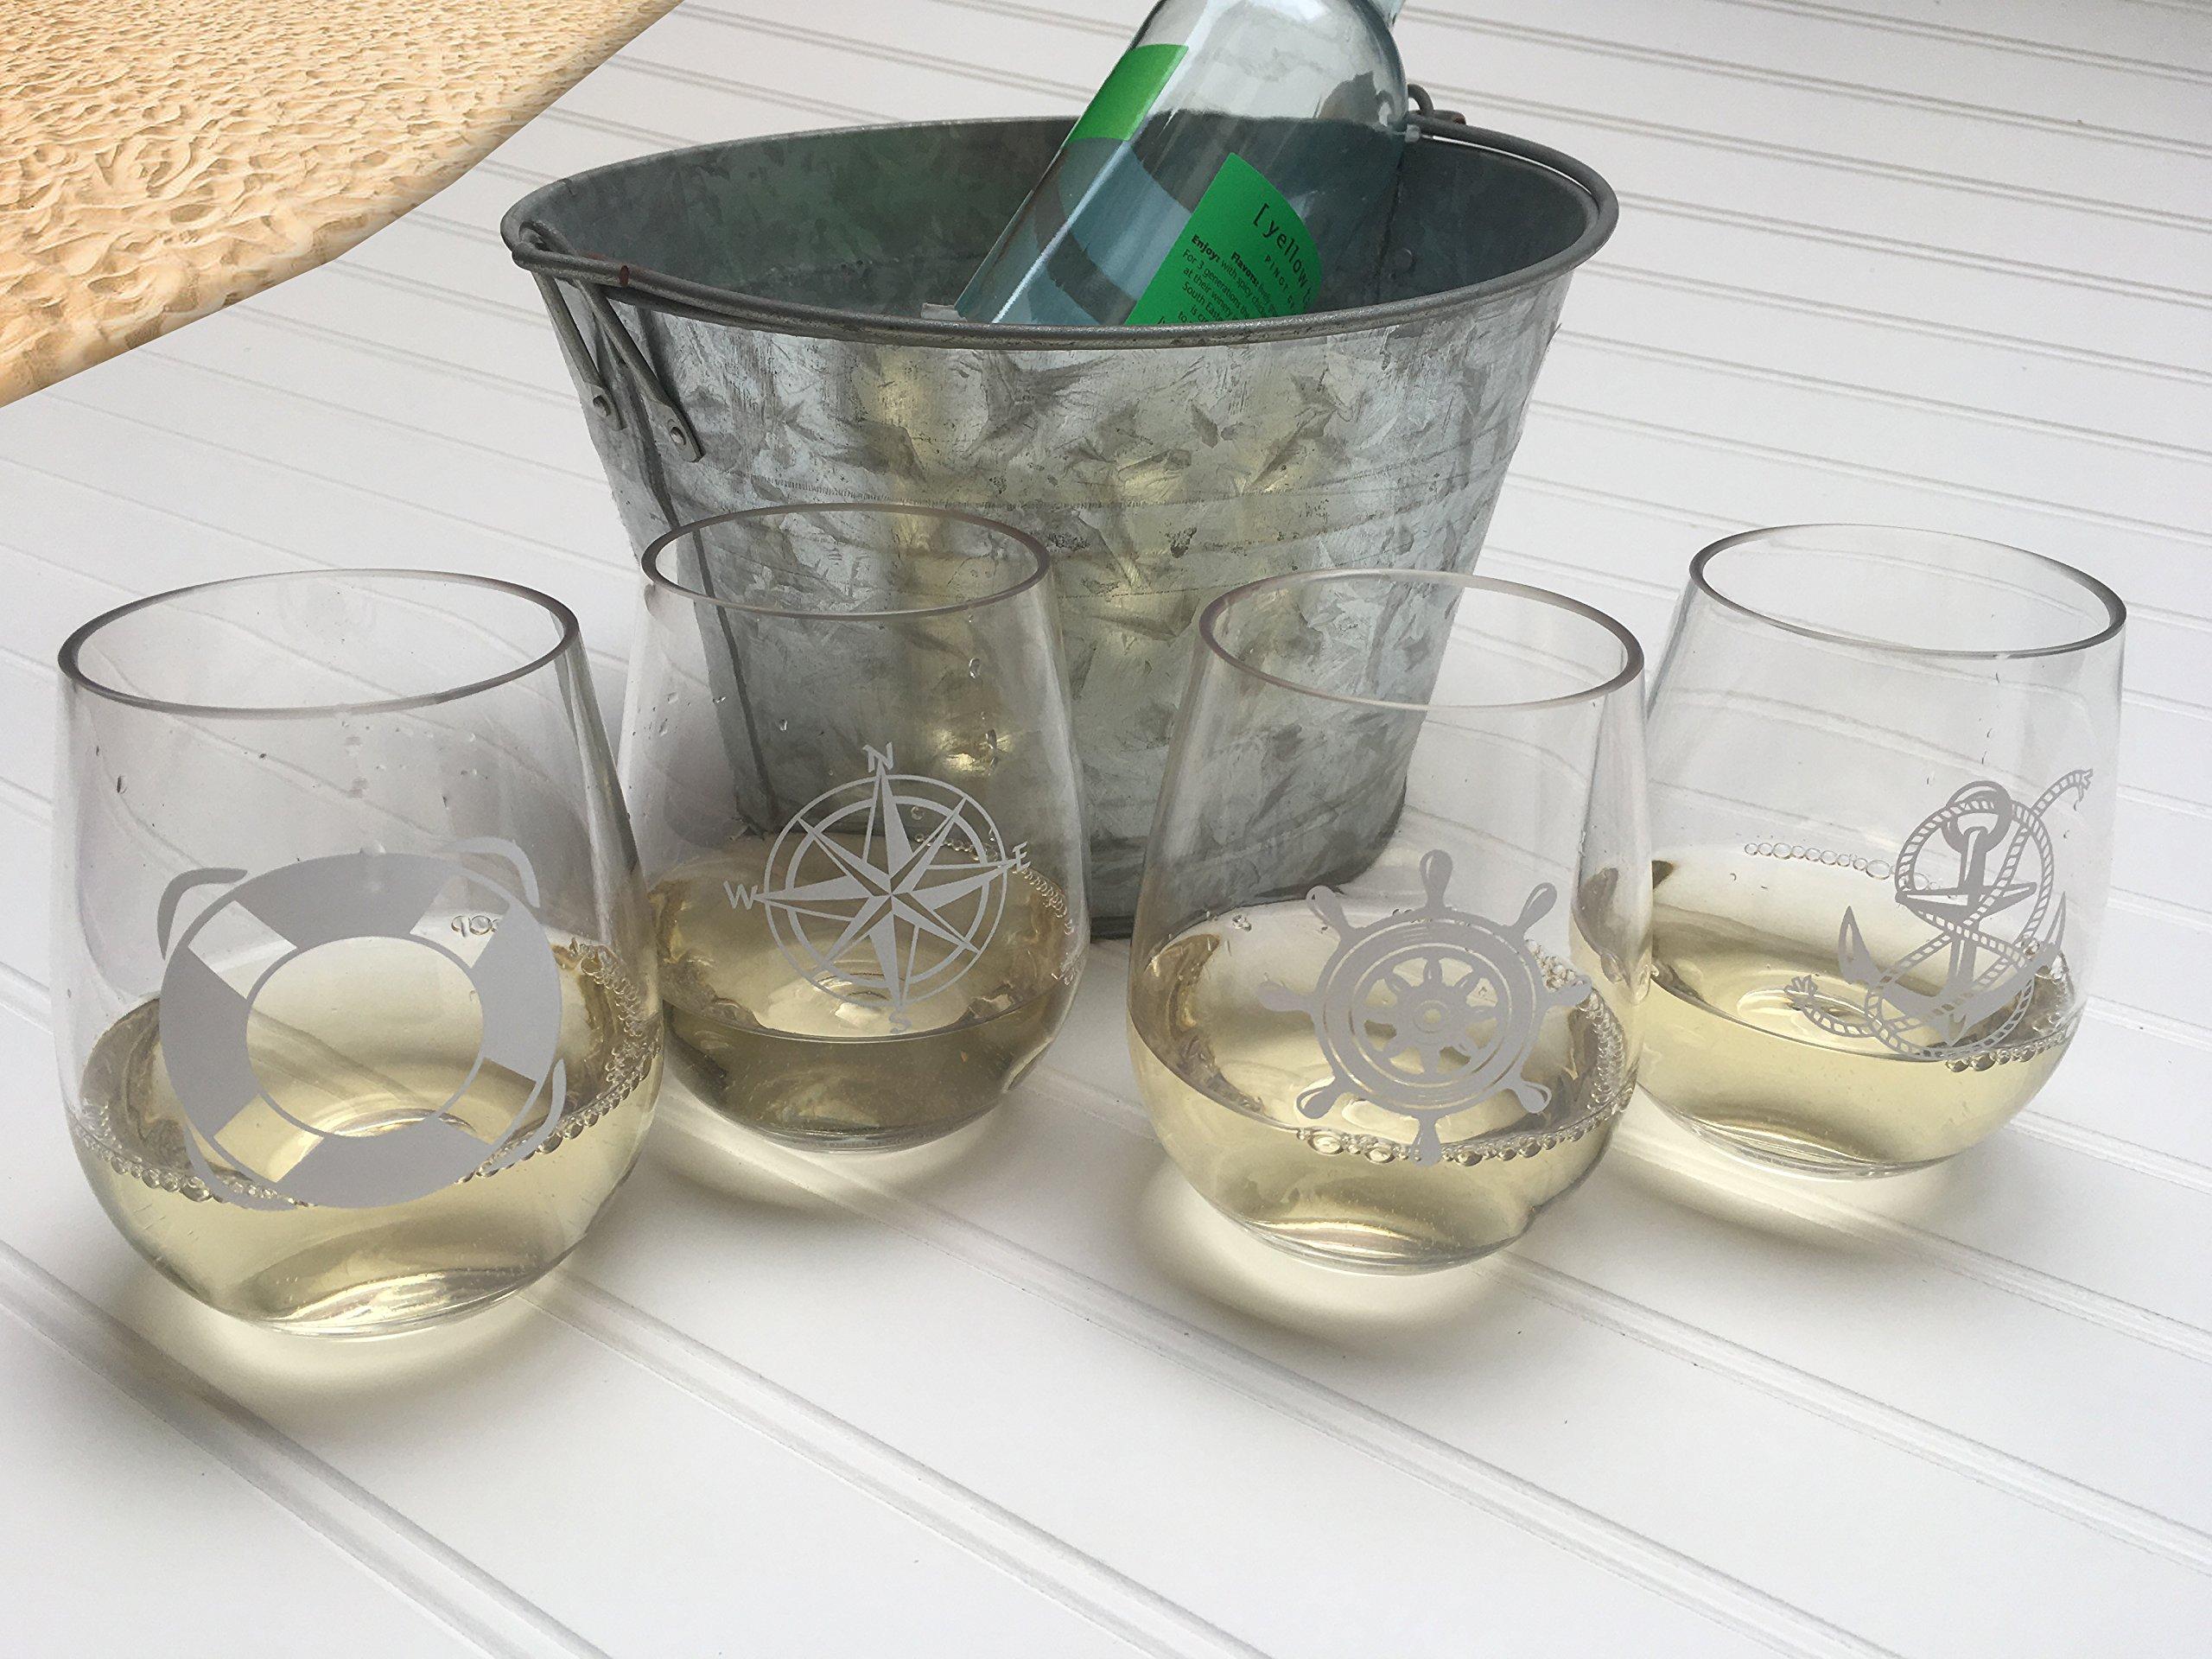 SET OF 4 -Stemless Boat Wine Glasses-Nautical Themed, Plastic, 16oz, Pool Wine Glasses, Shatter Proof Drinking Glasses…